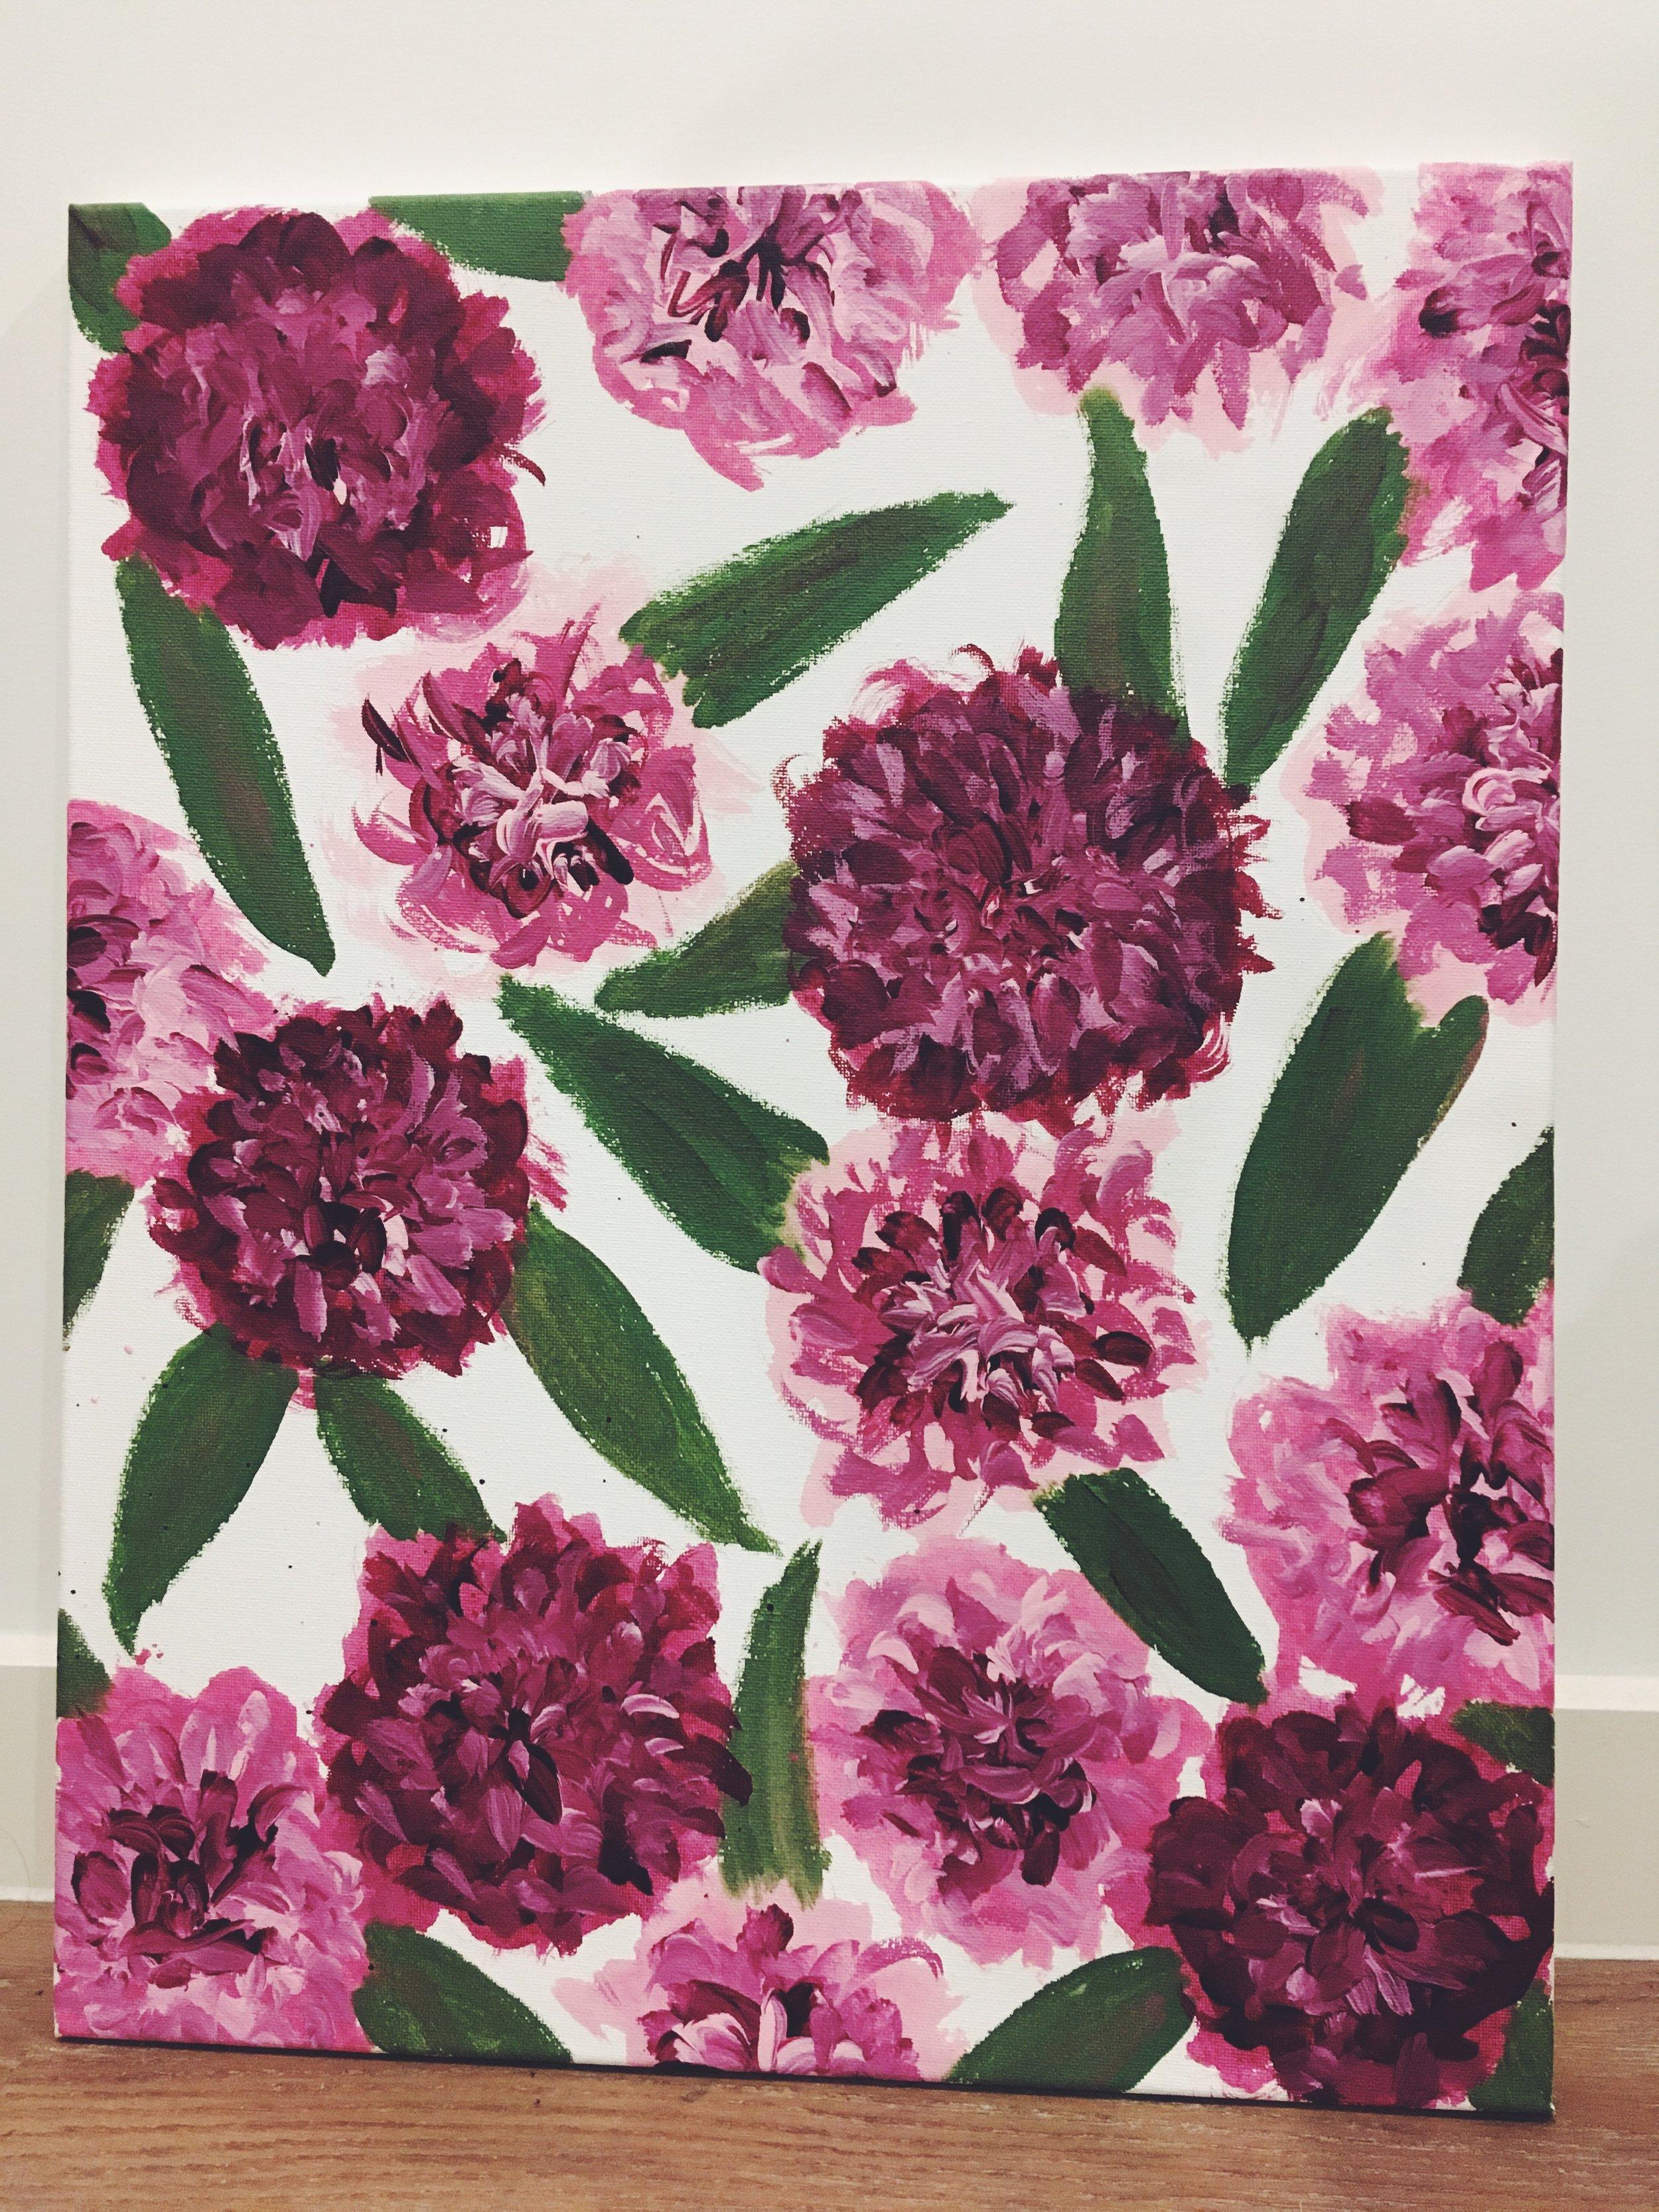 edward kwan hand painted floral bow ties melbourne australia 6.JPG